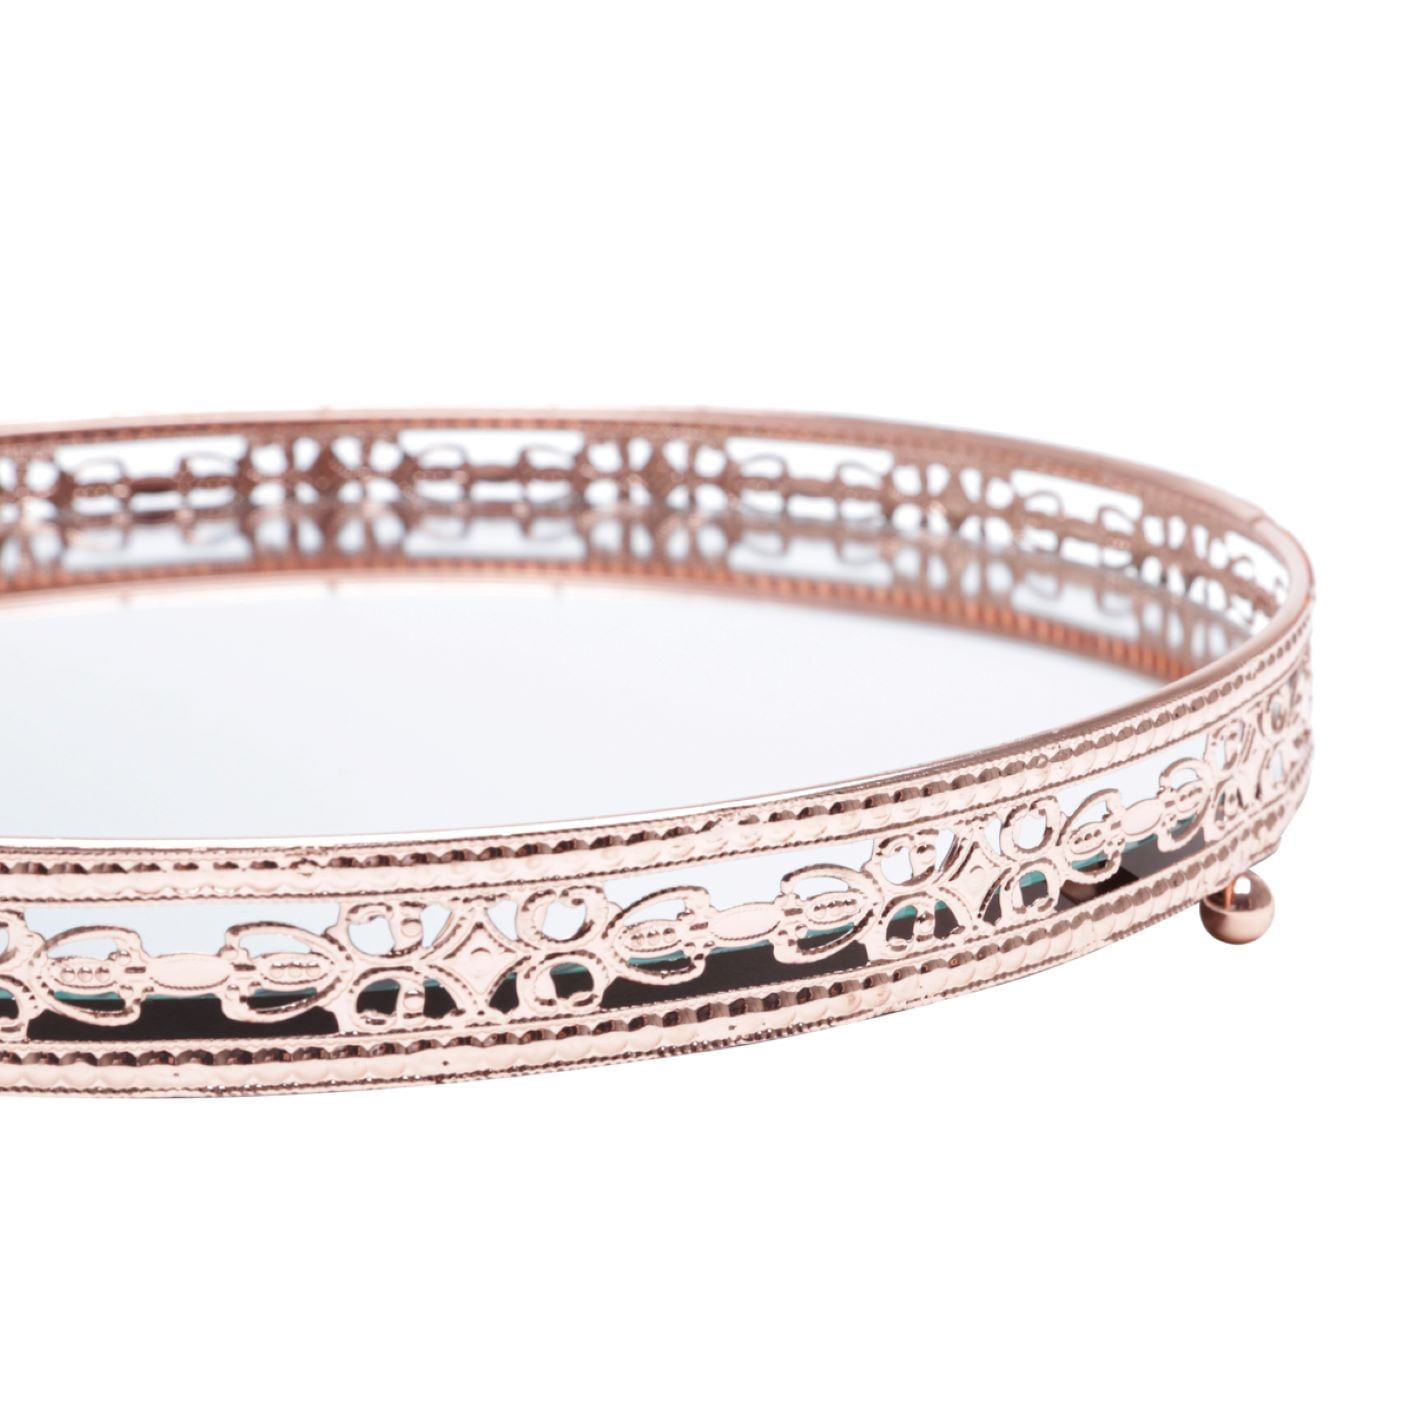 Bandeja Espelhada Decorativa Cobre - Redonda 19cm